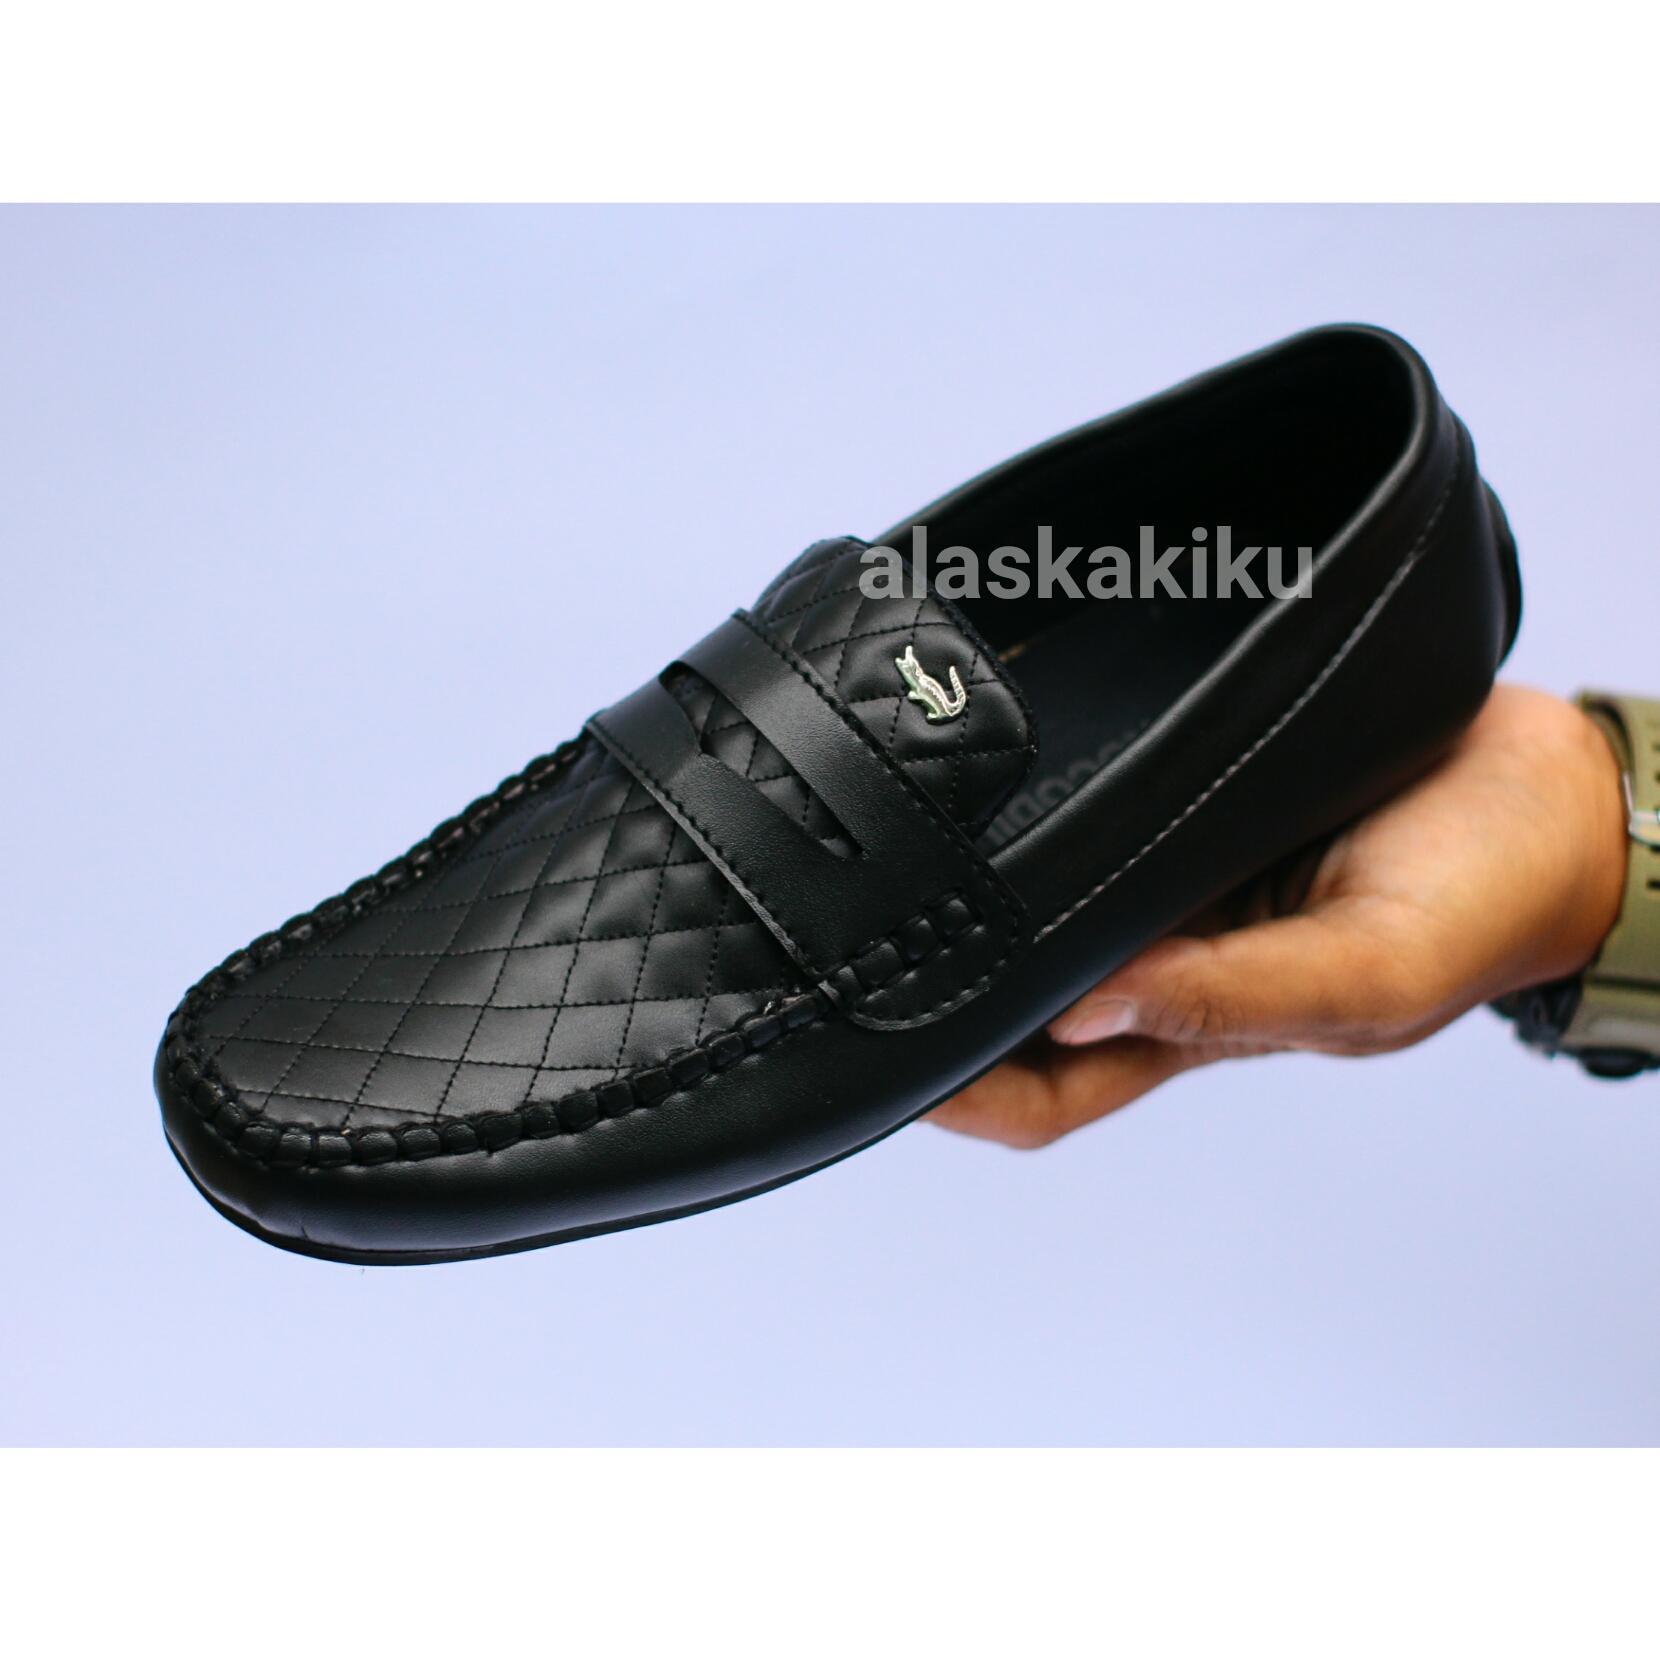 sepatu casual pria loafers crocodile pria kasual slop slip on kasual ( lokal ) kickers guci